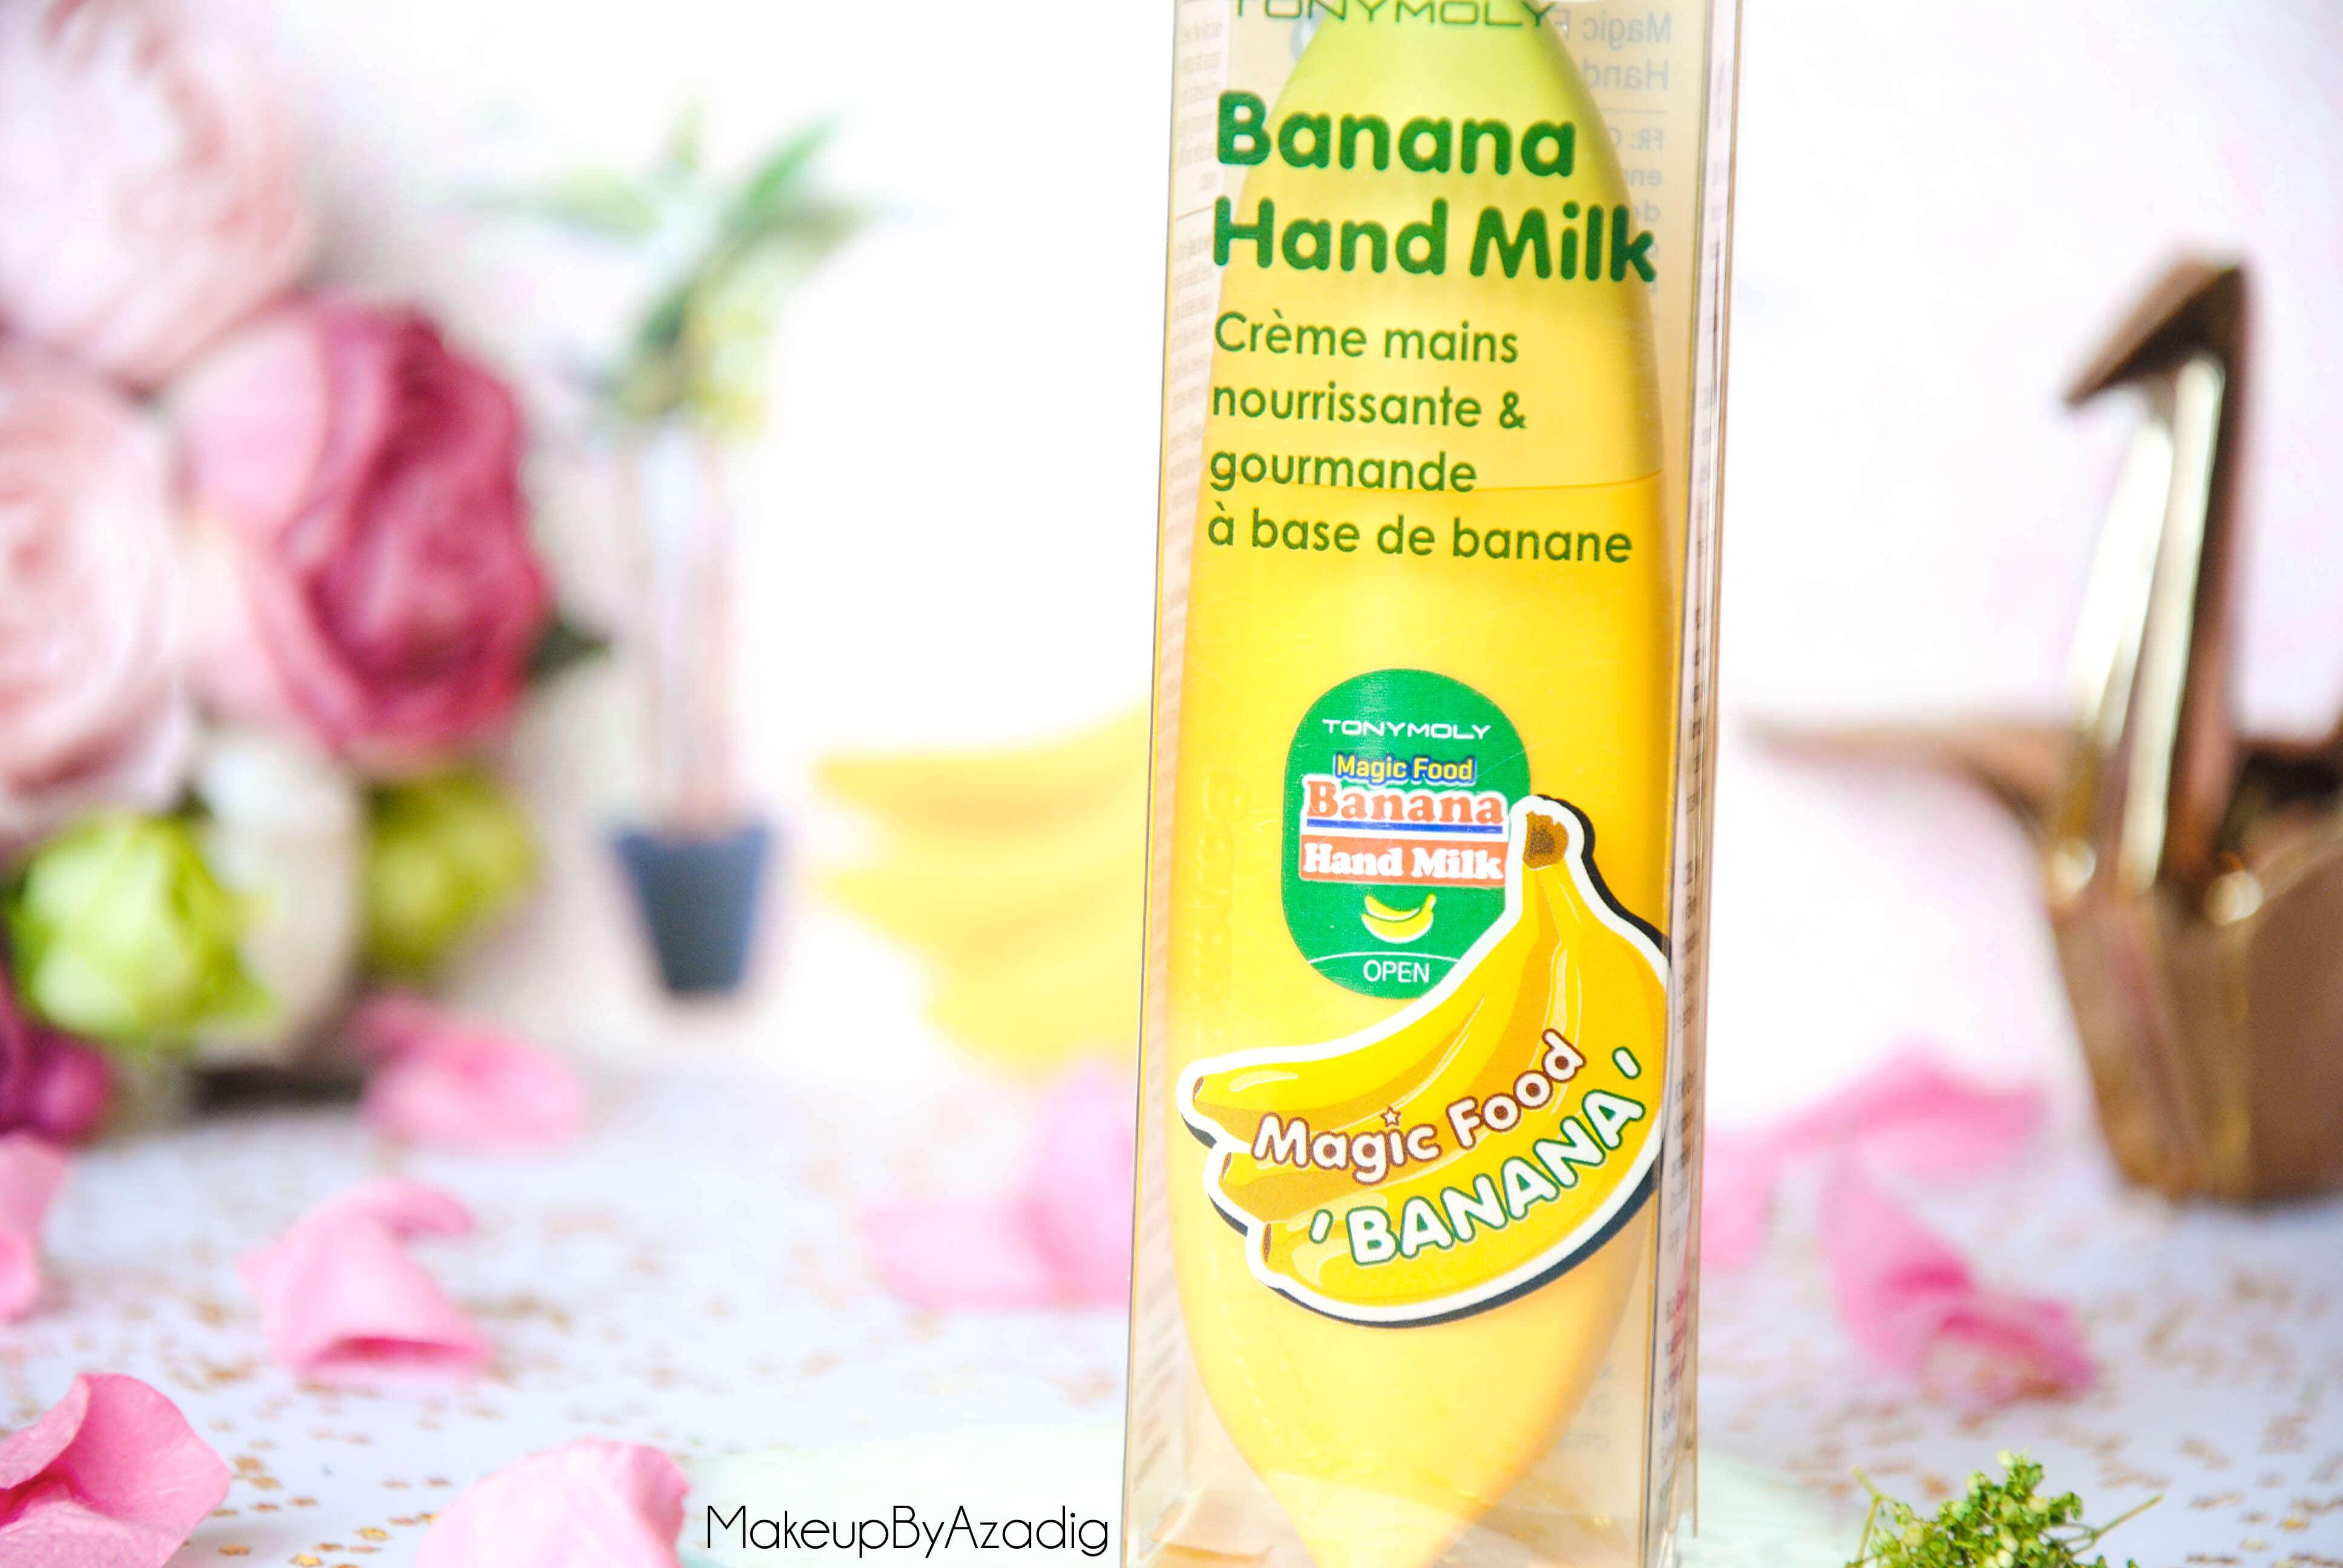 magic-food-banana-hand-milk-tonymoly-banane-creme-main-hand-cream-review-revue-paris-dijon-troyes-makeupbyazadig-kawai-yellow